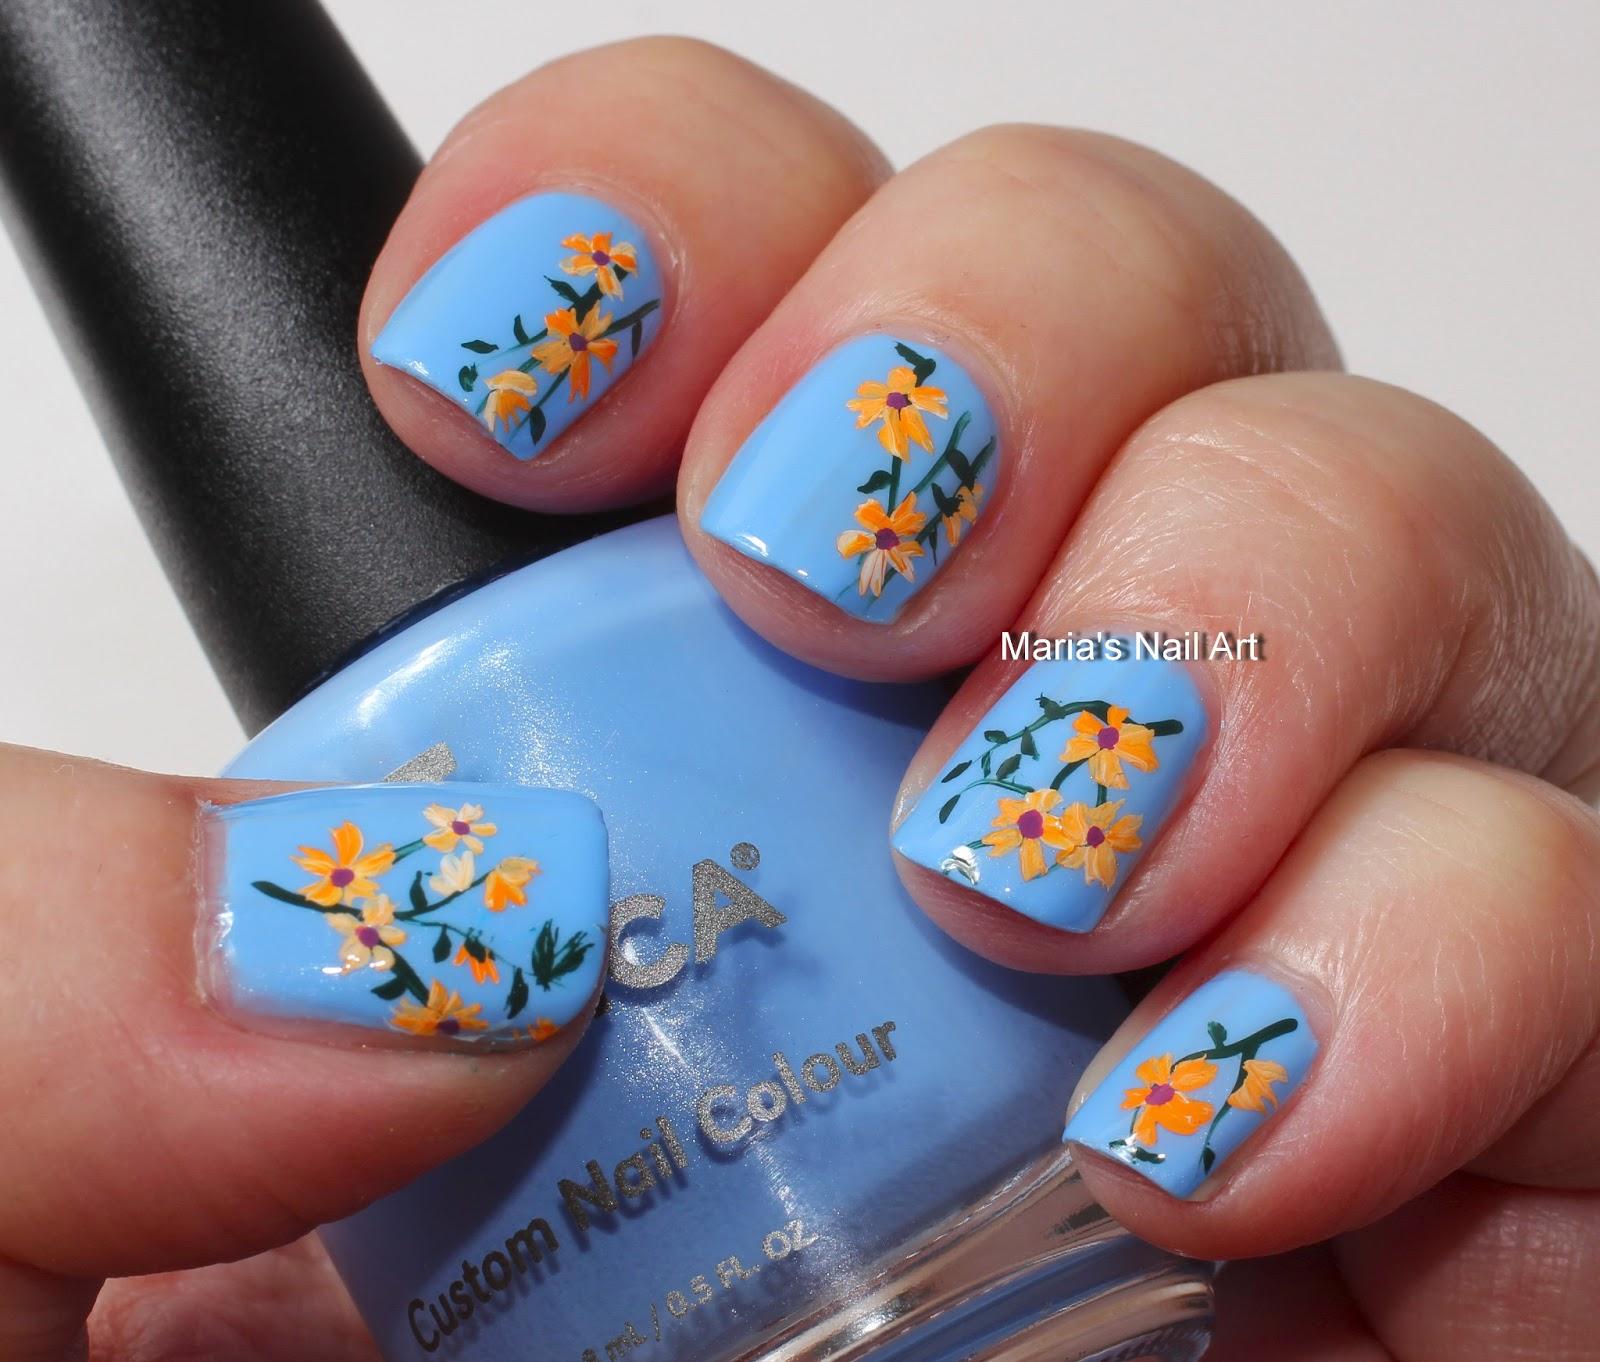 Nailzini A Nail Art Blog: Marias Nail Art And Polish Blog: Orange Flowers For Sophia